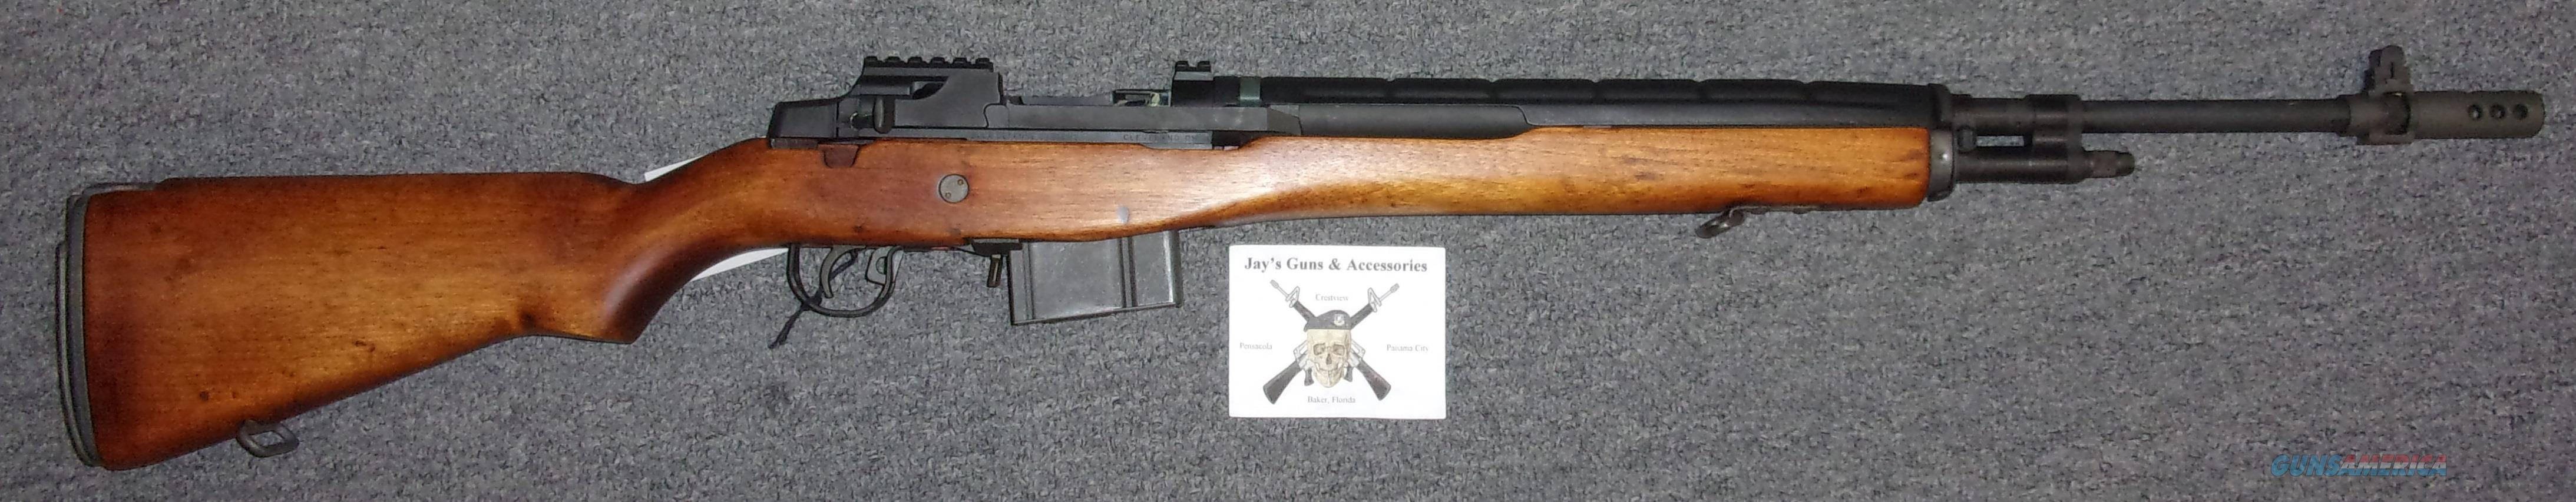 Bula XM21  Guns > Rifles > Springfield Armory Rifles > M1A/M14